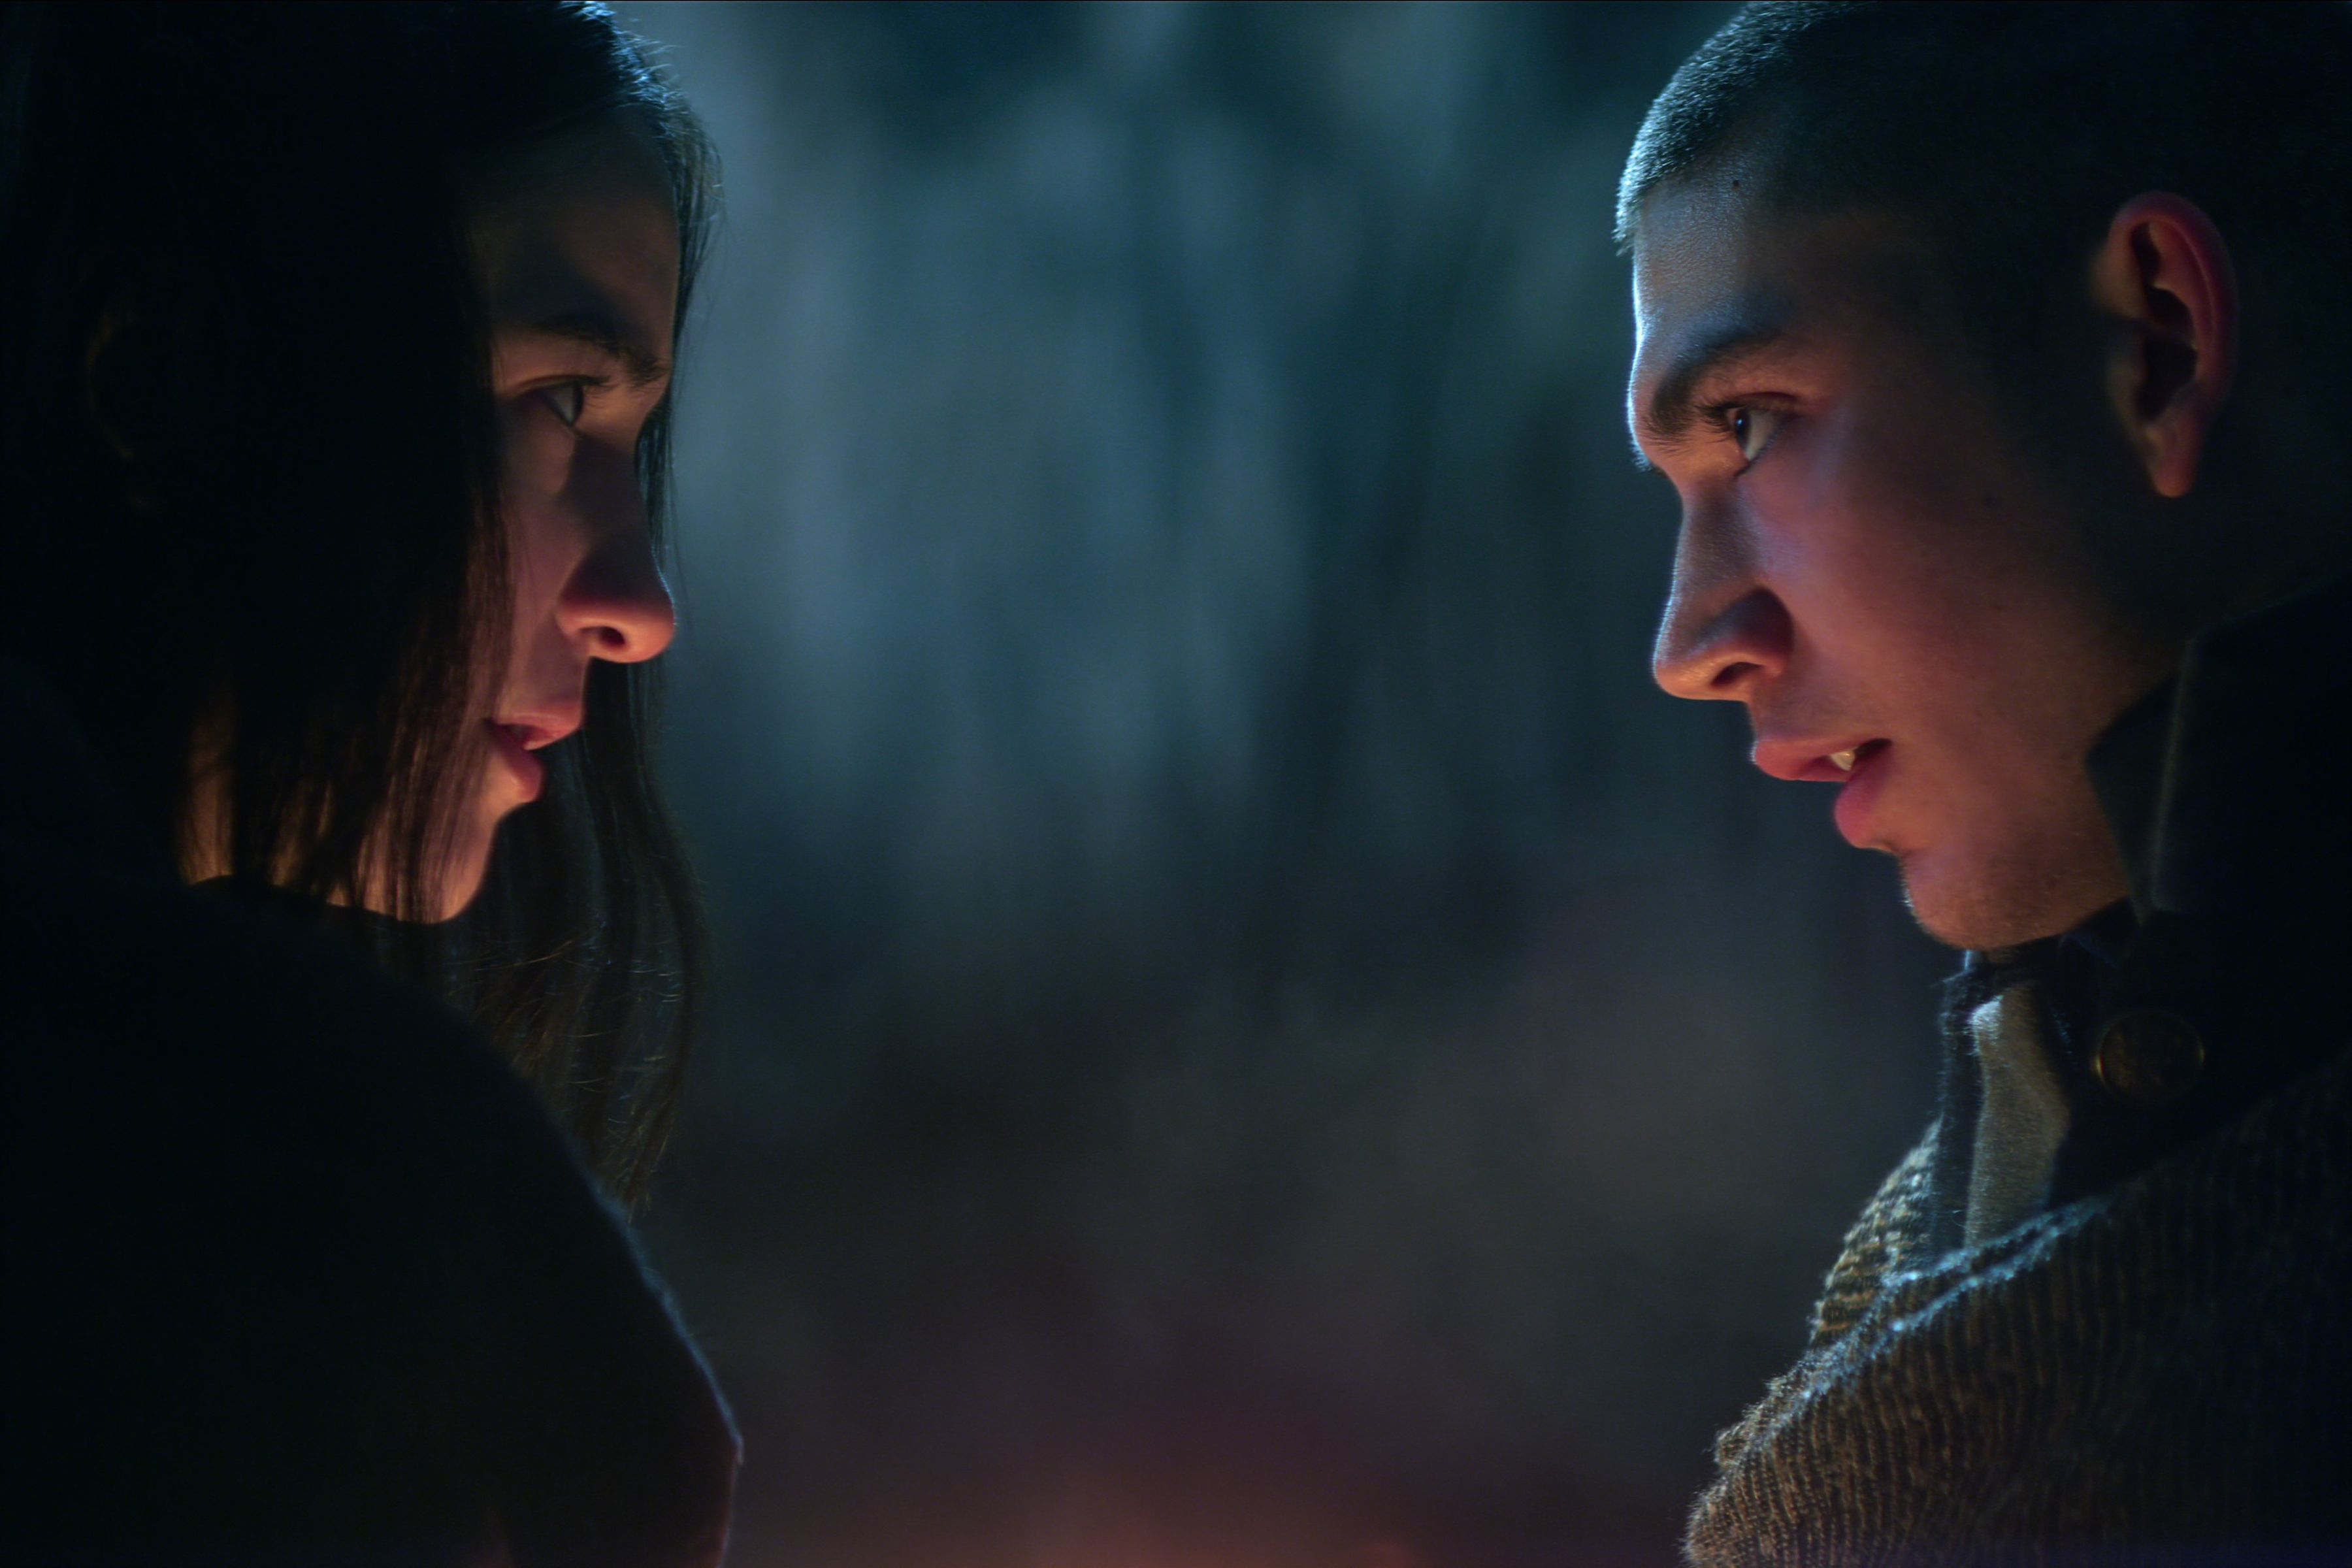 SHADOW AND BONE (L to R) JESSIE MEI LI as ALINA STARKOV and ARCHIE RENAUX as MALYEN ORETSEV in SHADOW AND BONE